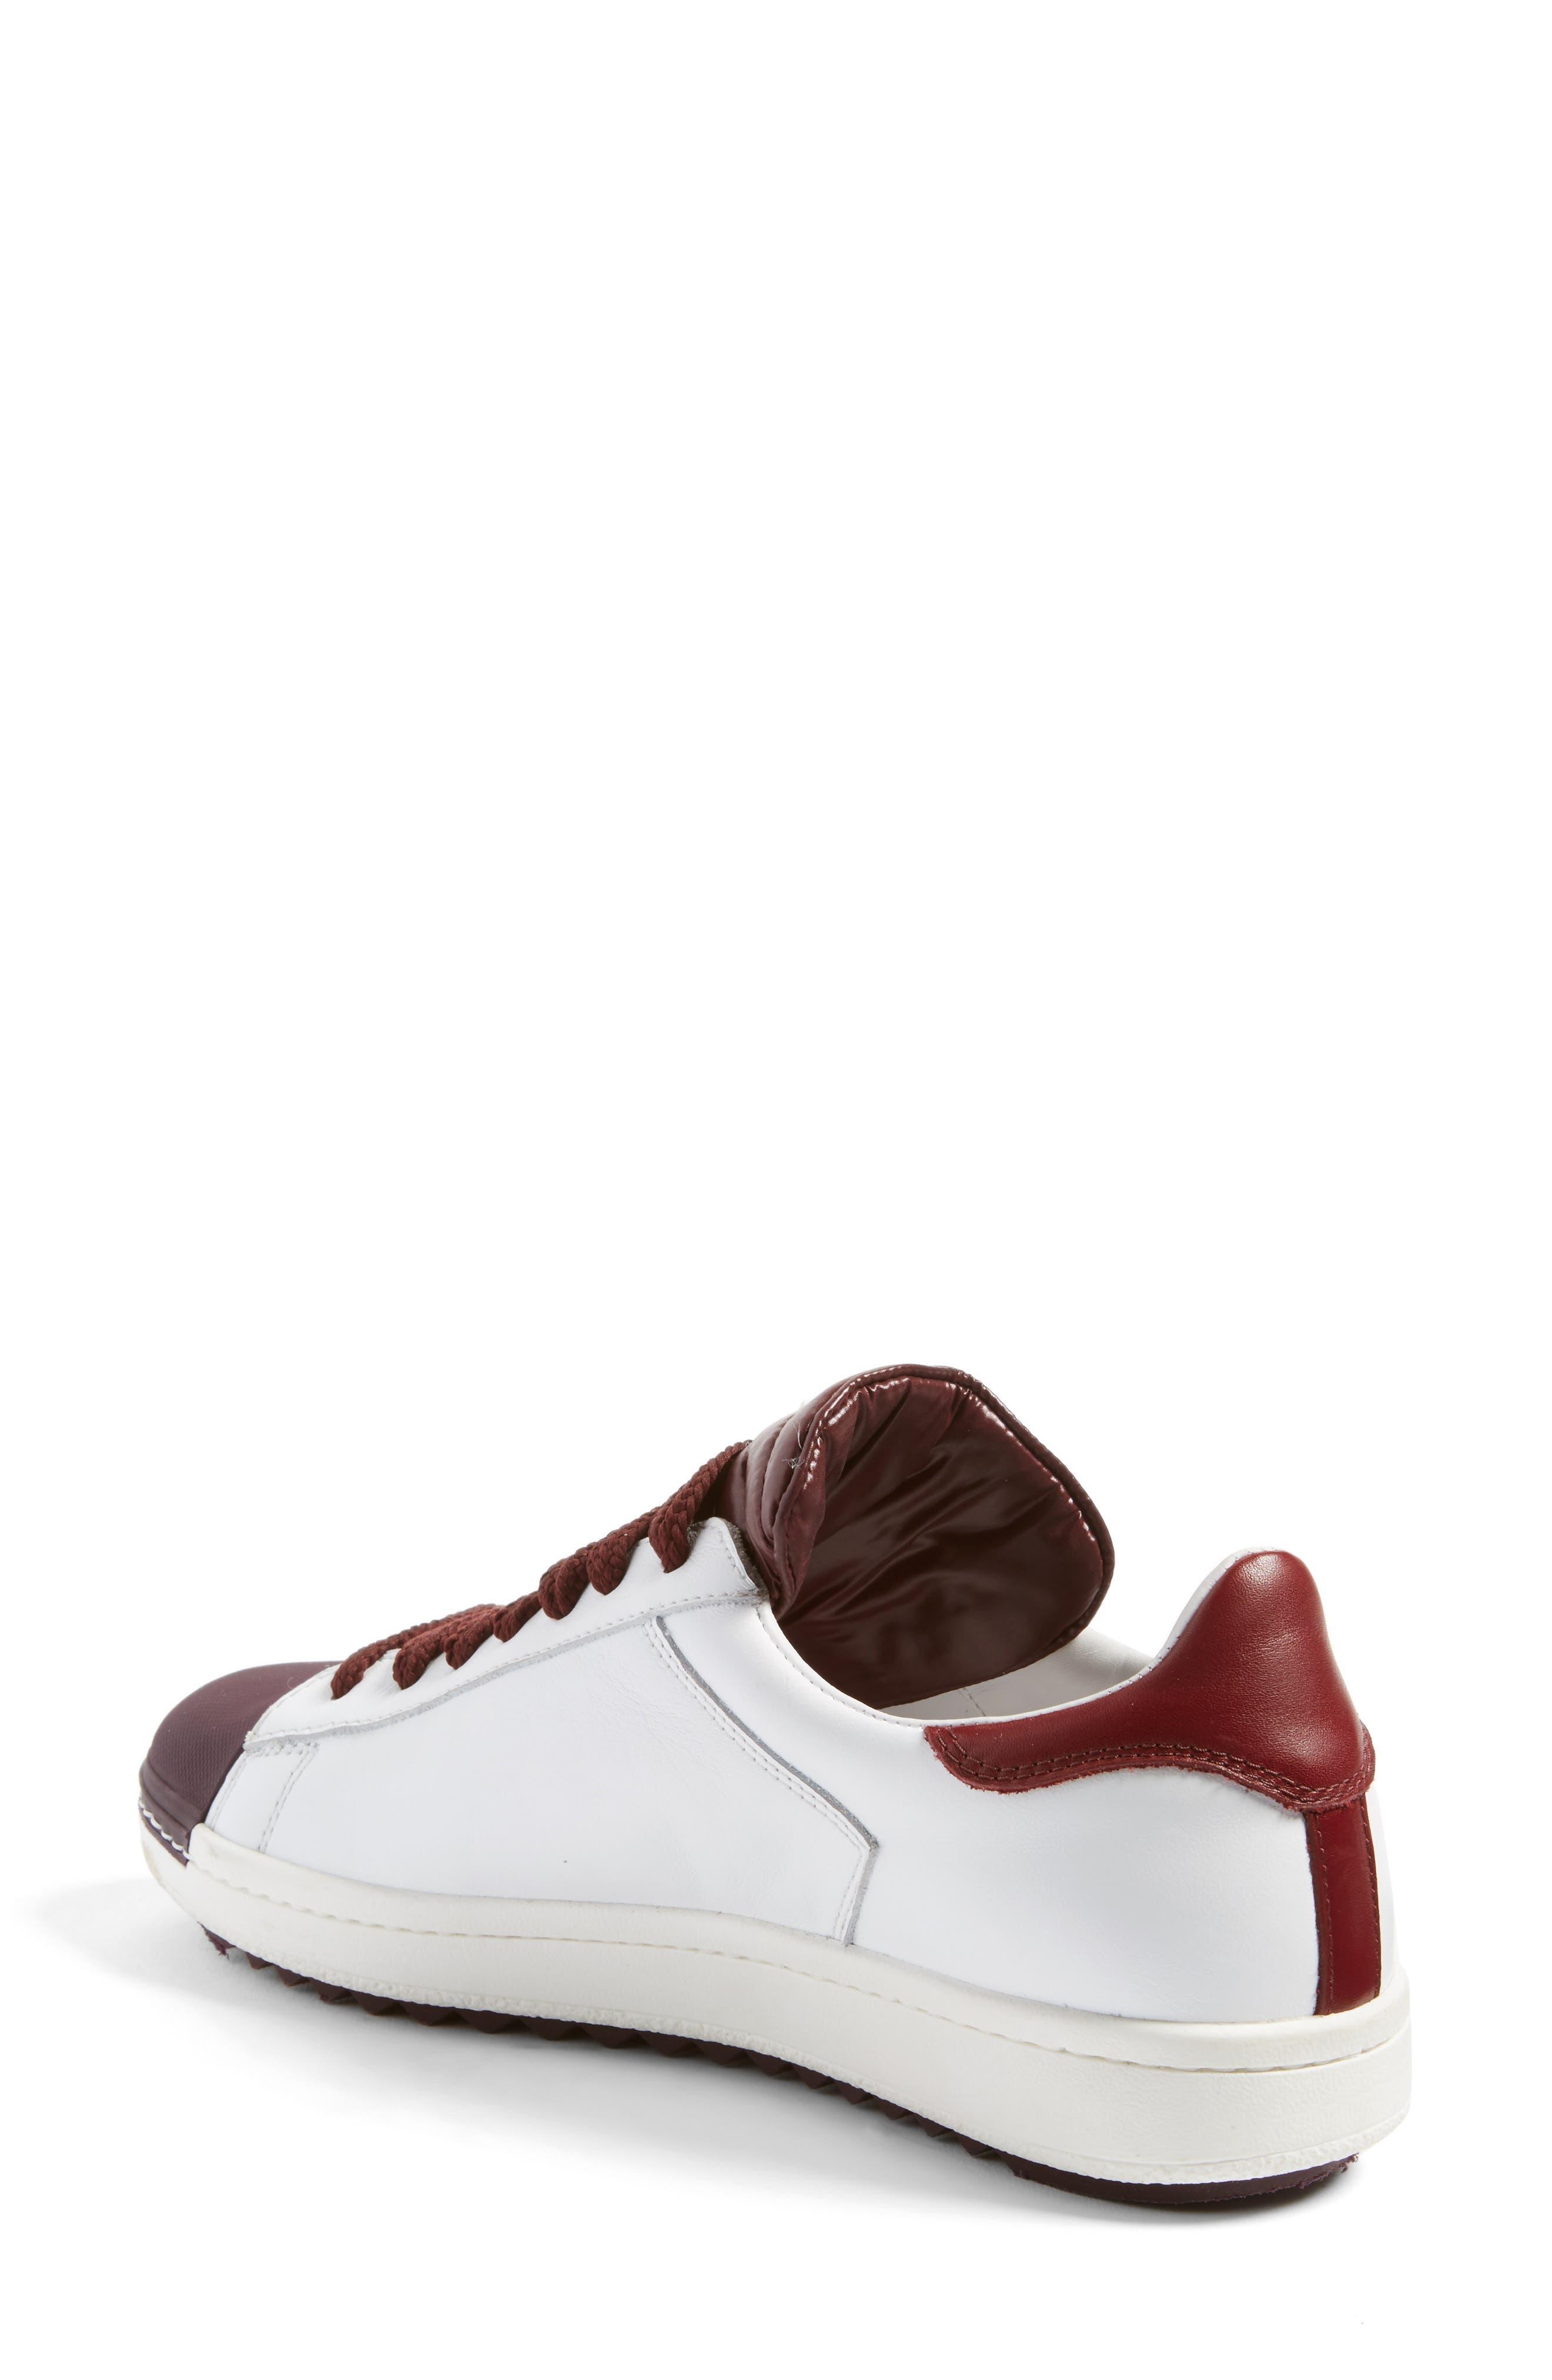 'Angeline Scarpa' Sneaker,                             Alternate thumbnail 5, color,